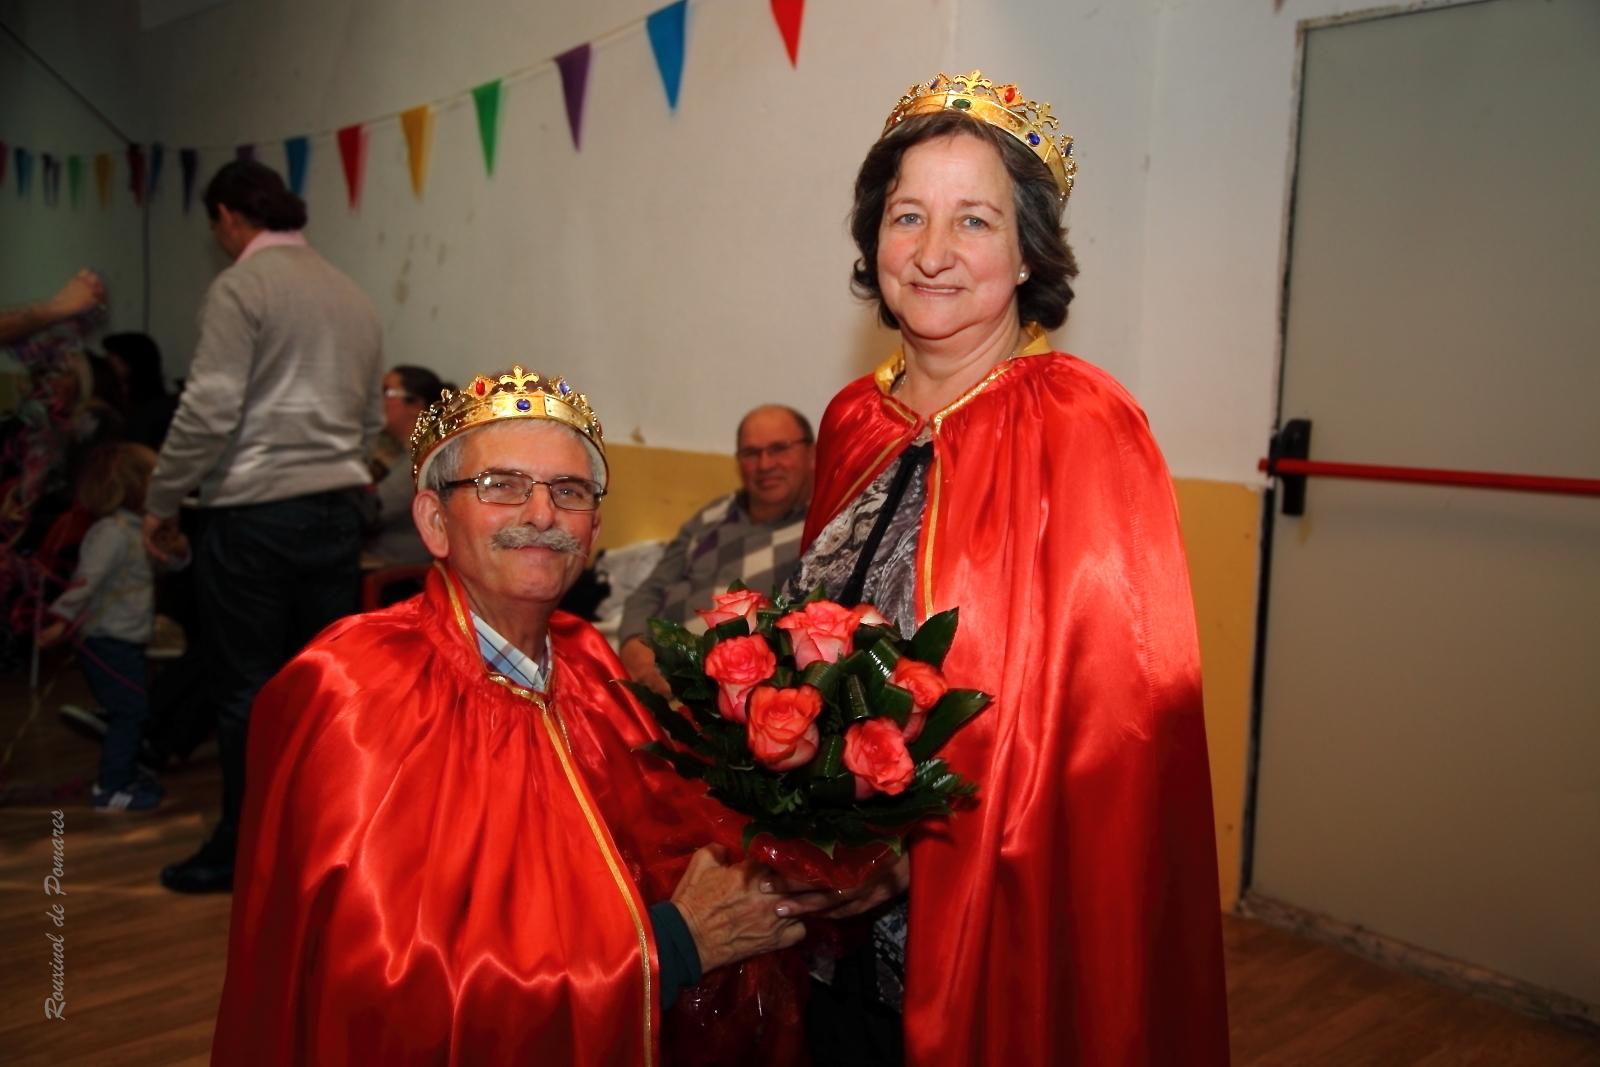 Baile da Pinha -2015 - Soito da Ruiva (0028)